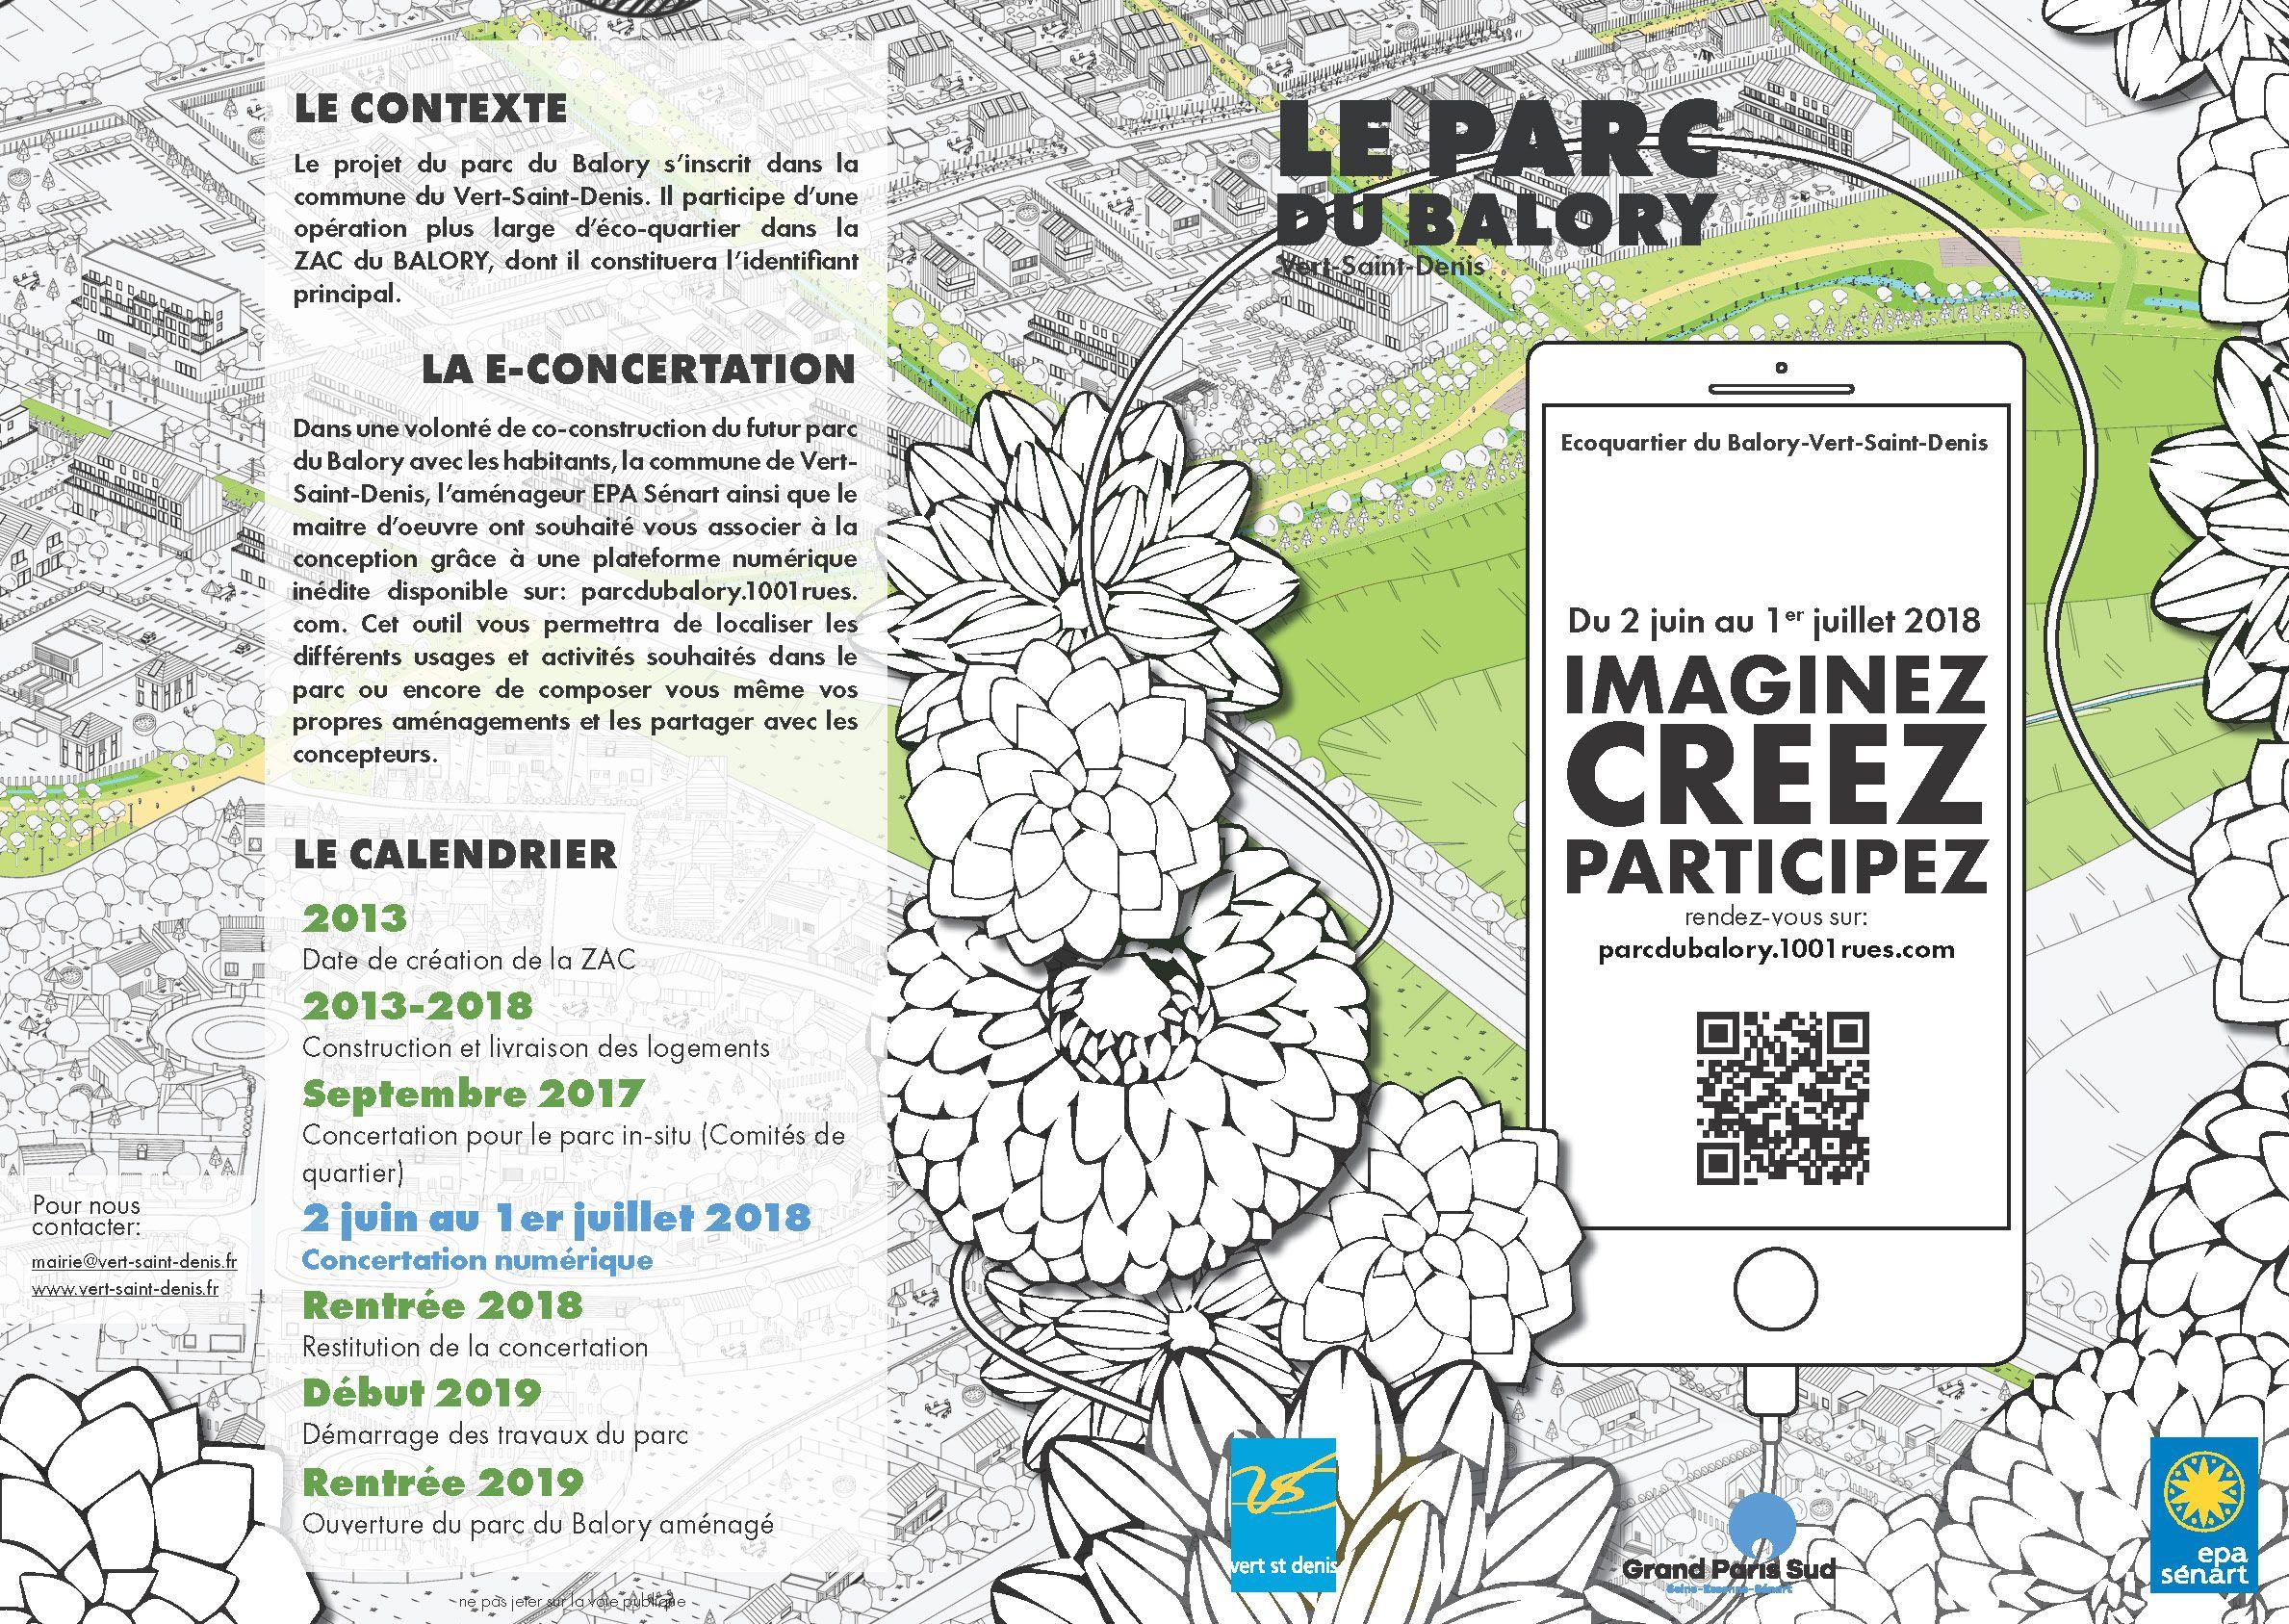 Ecoquartier Du Balory Mairie Vert Saint Denis